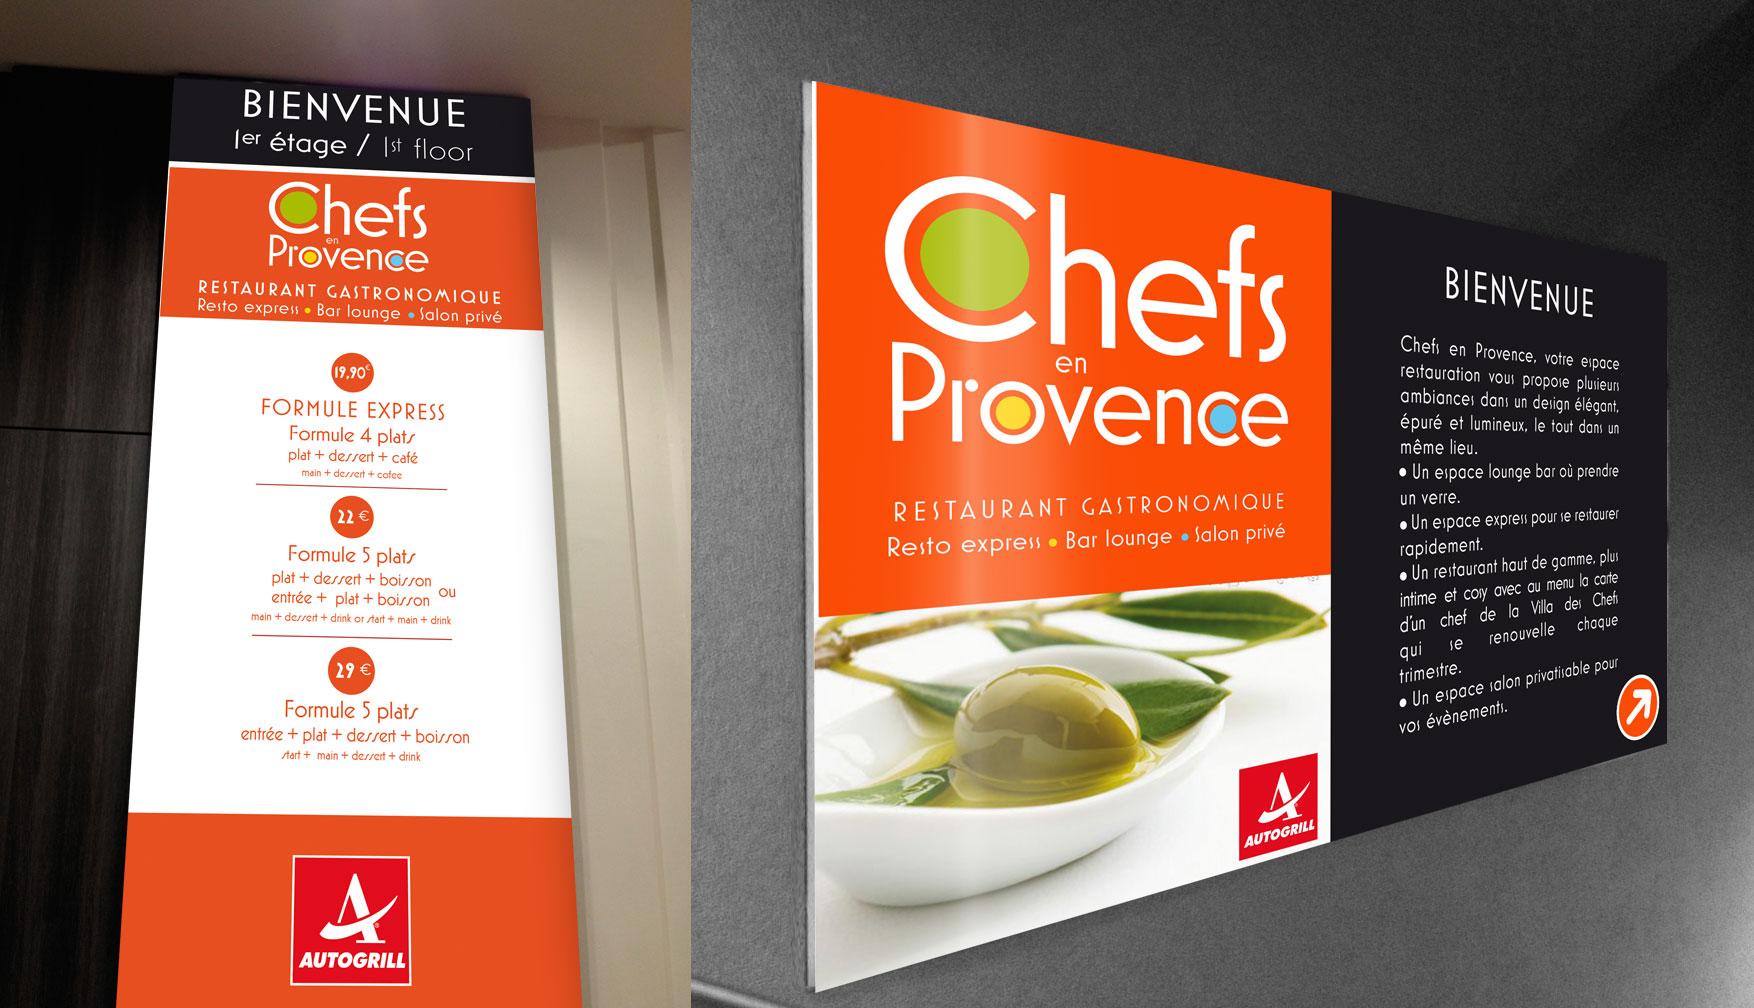 Chefs en Provence – Autogrill